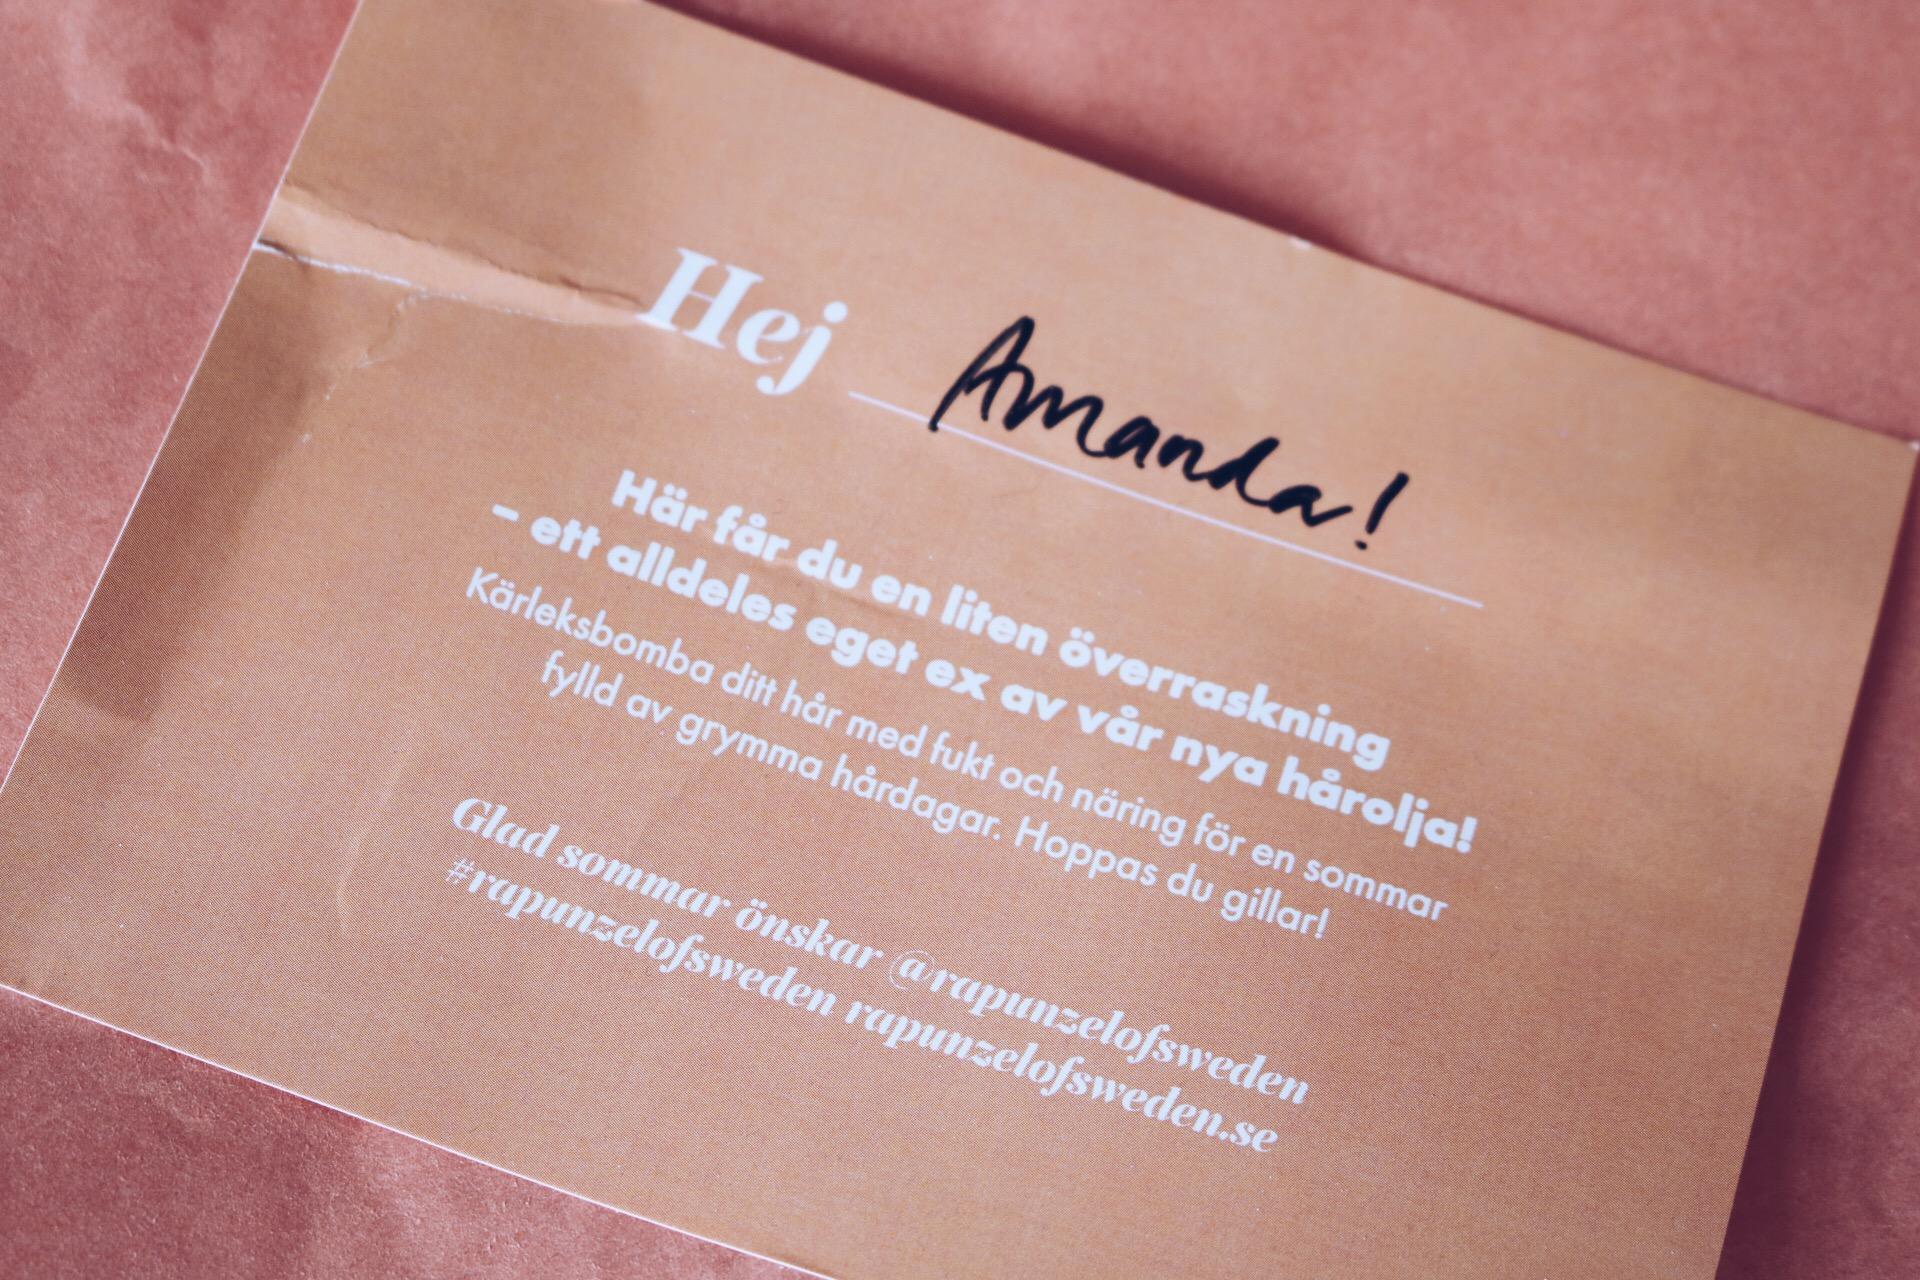 Rapunzel of Sweden jojoba hårolja skönhetsblogg amandahans pressutskick